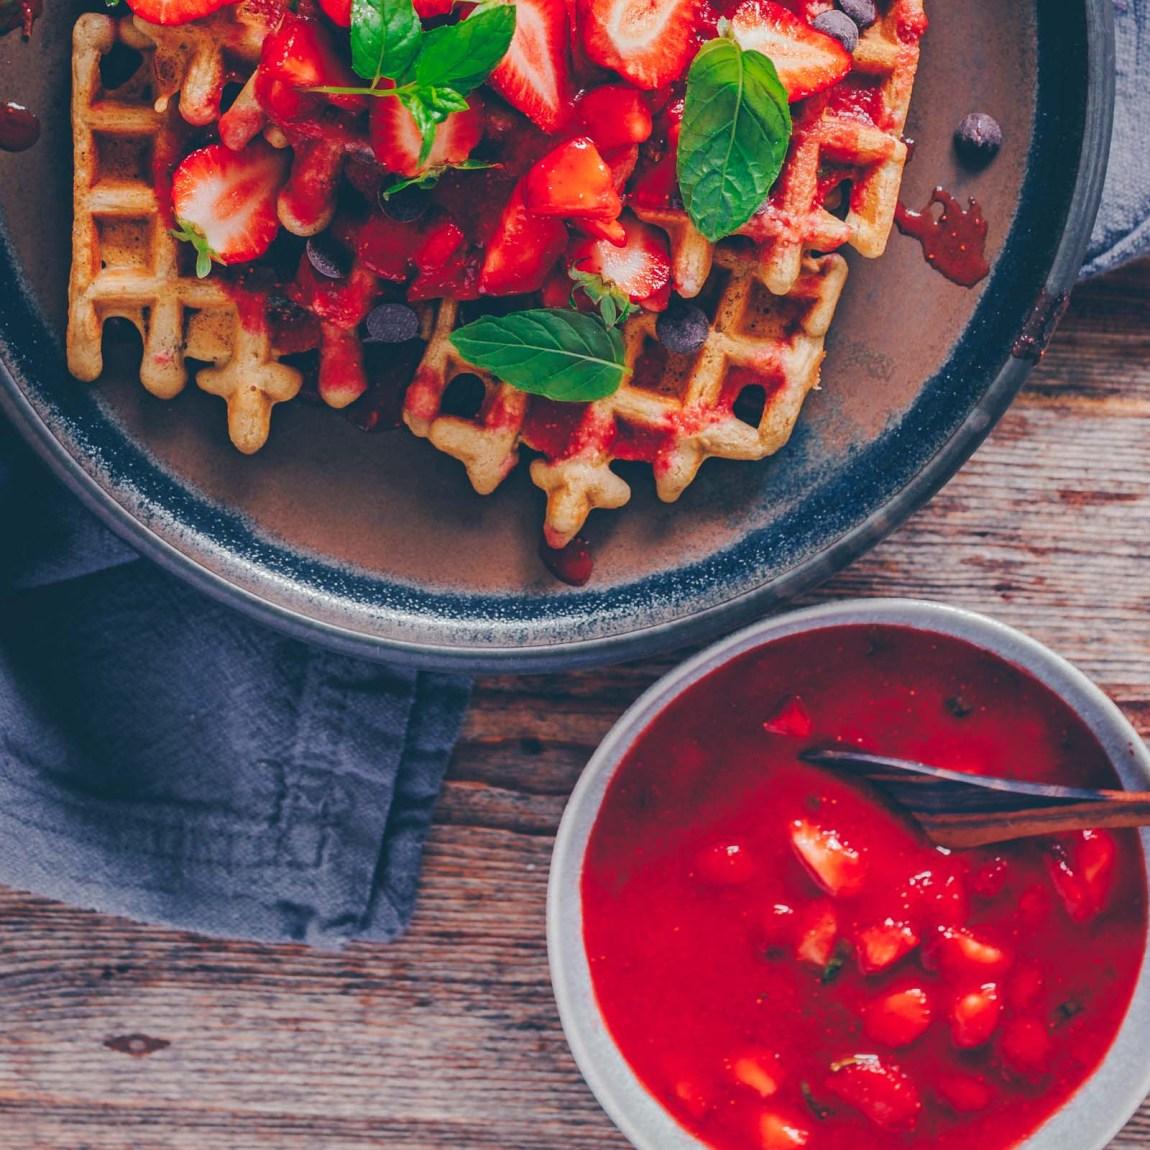 vegane Waffeln mit Erdbeere-Minz-Kompott